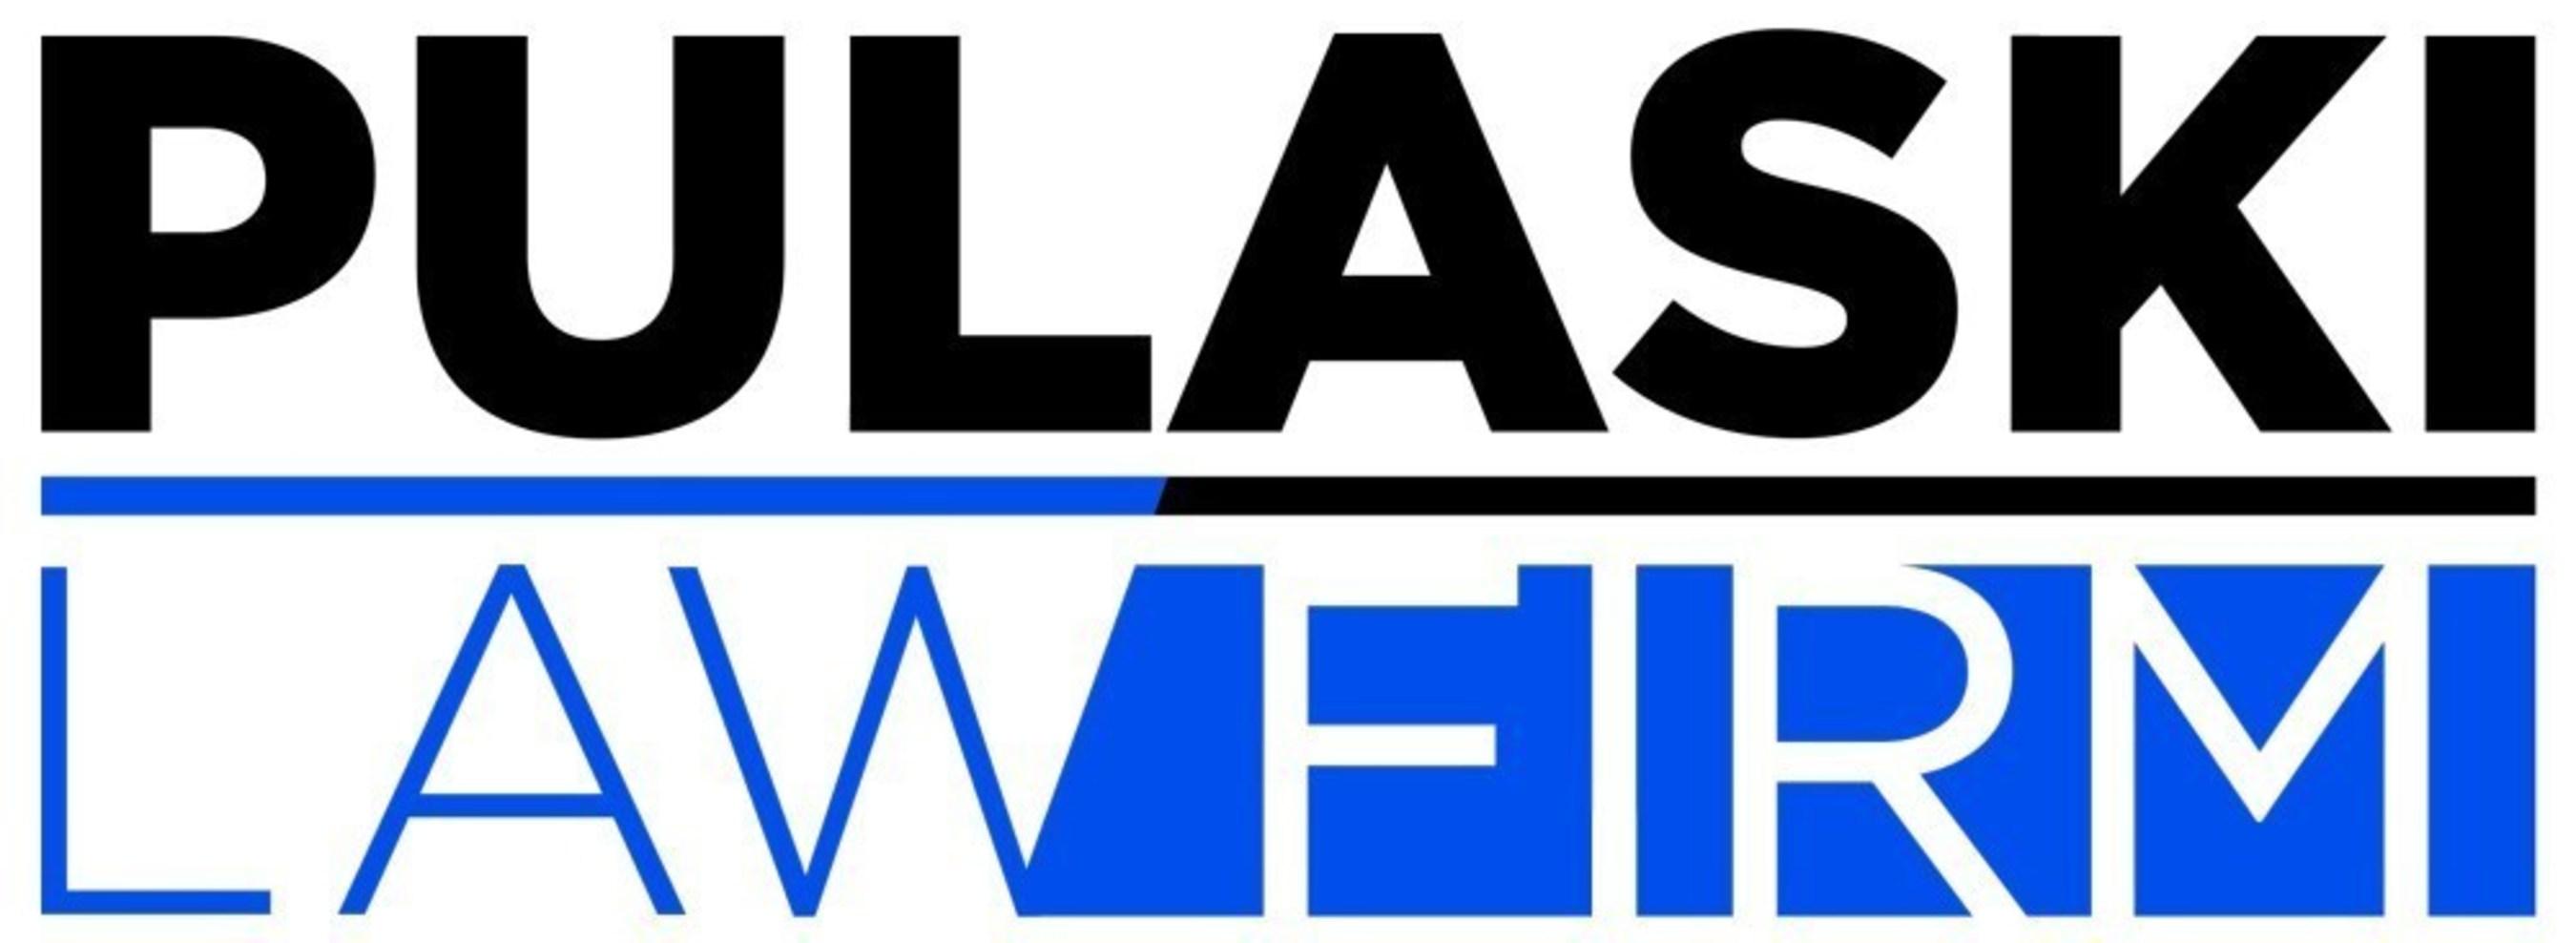 Pulaski Law Firm